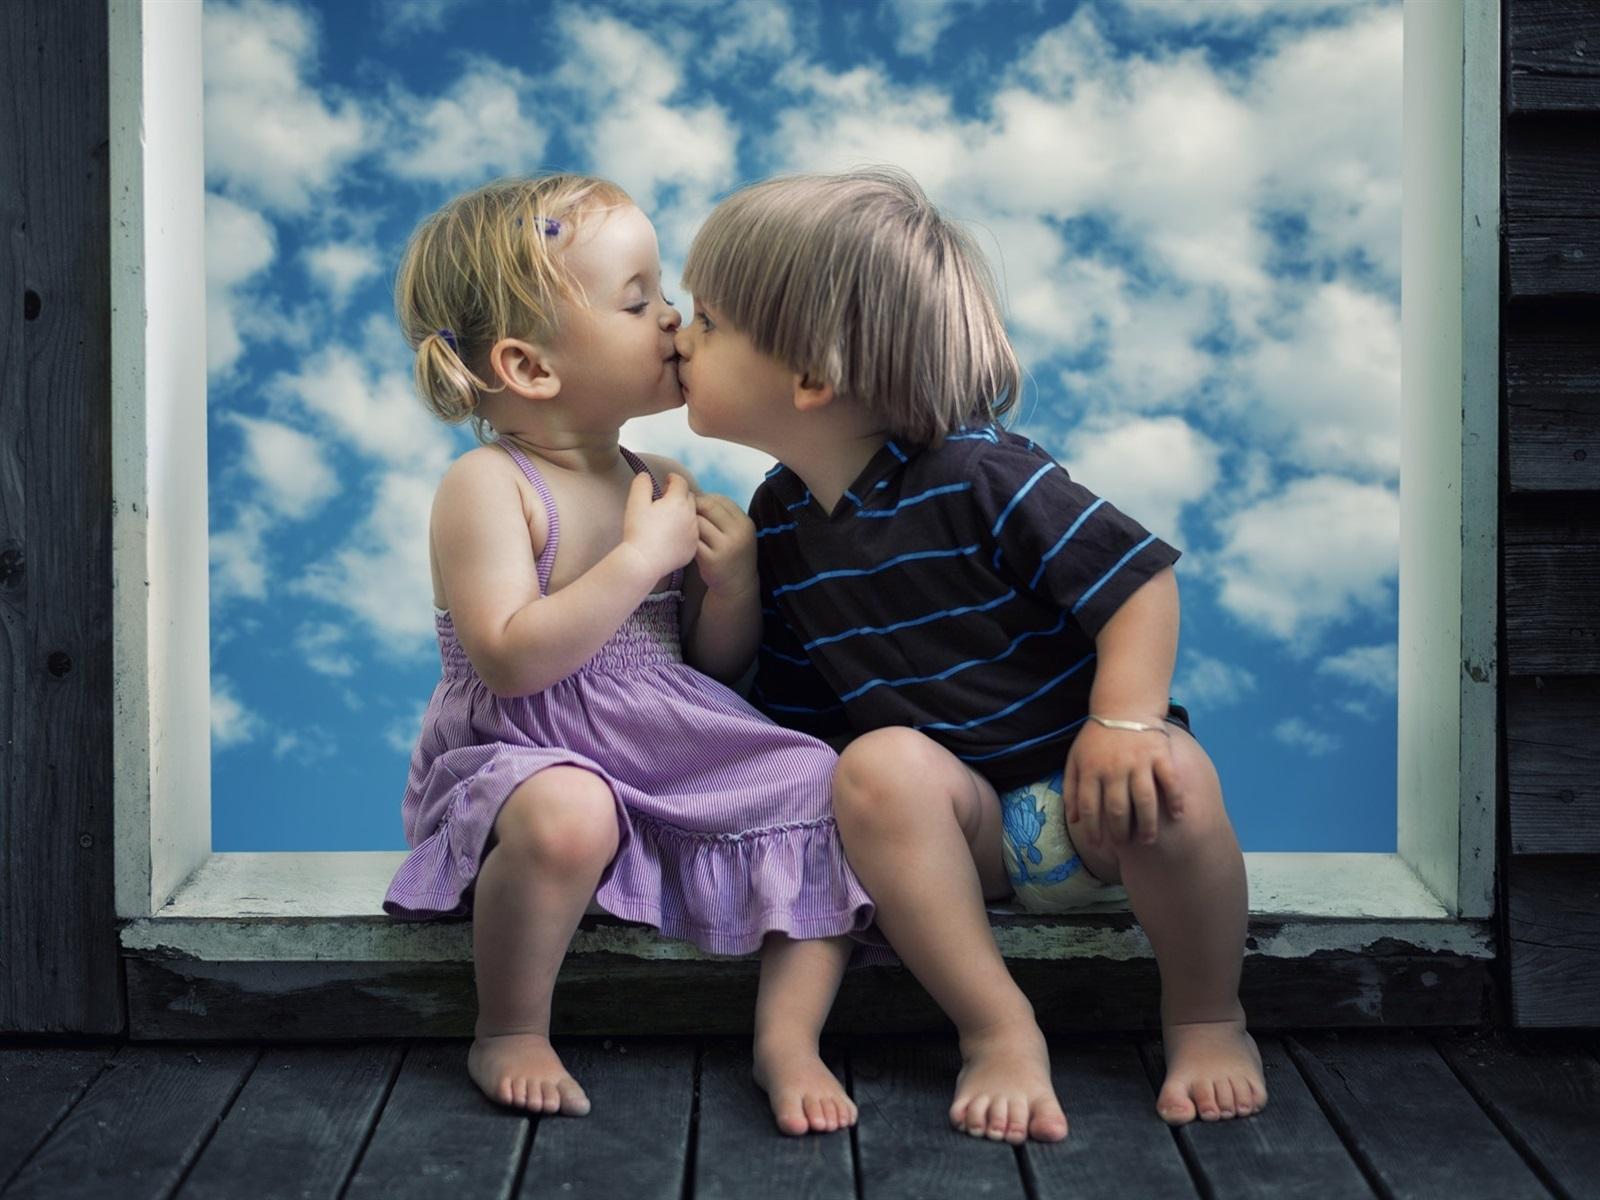 Fondos de pantalla Niño lindo niña y niño 1be903ff082